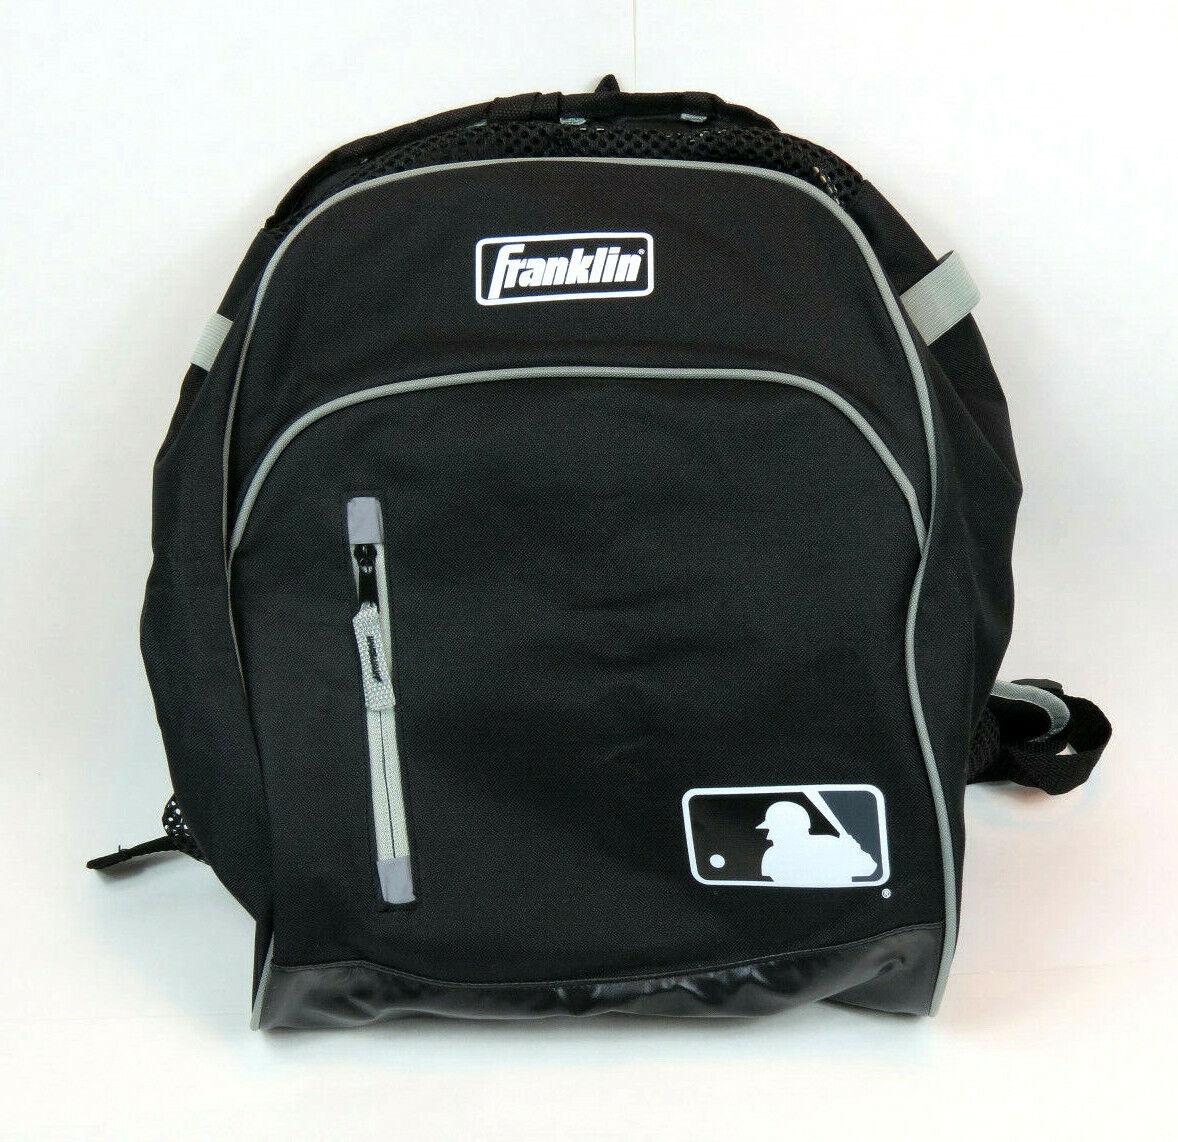 Franklin Sports MLB Batpack Bag - Perfect for Baseball, Soft